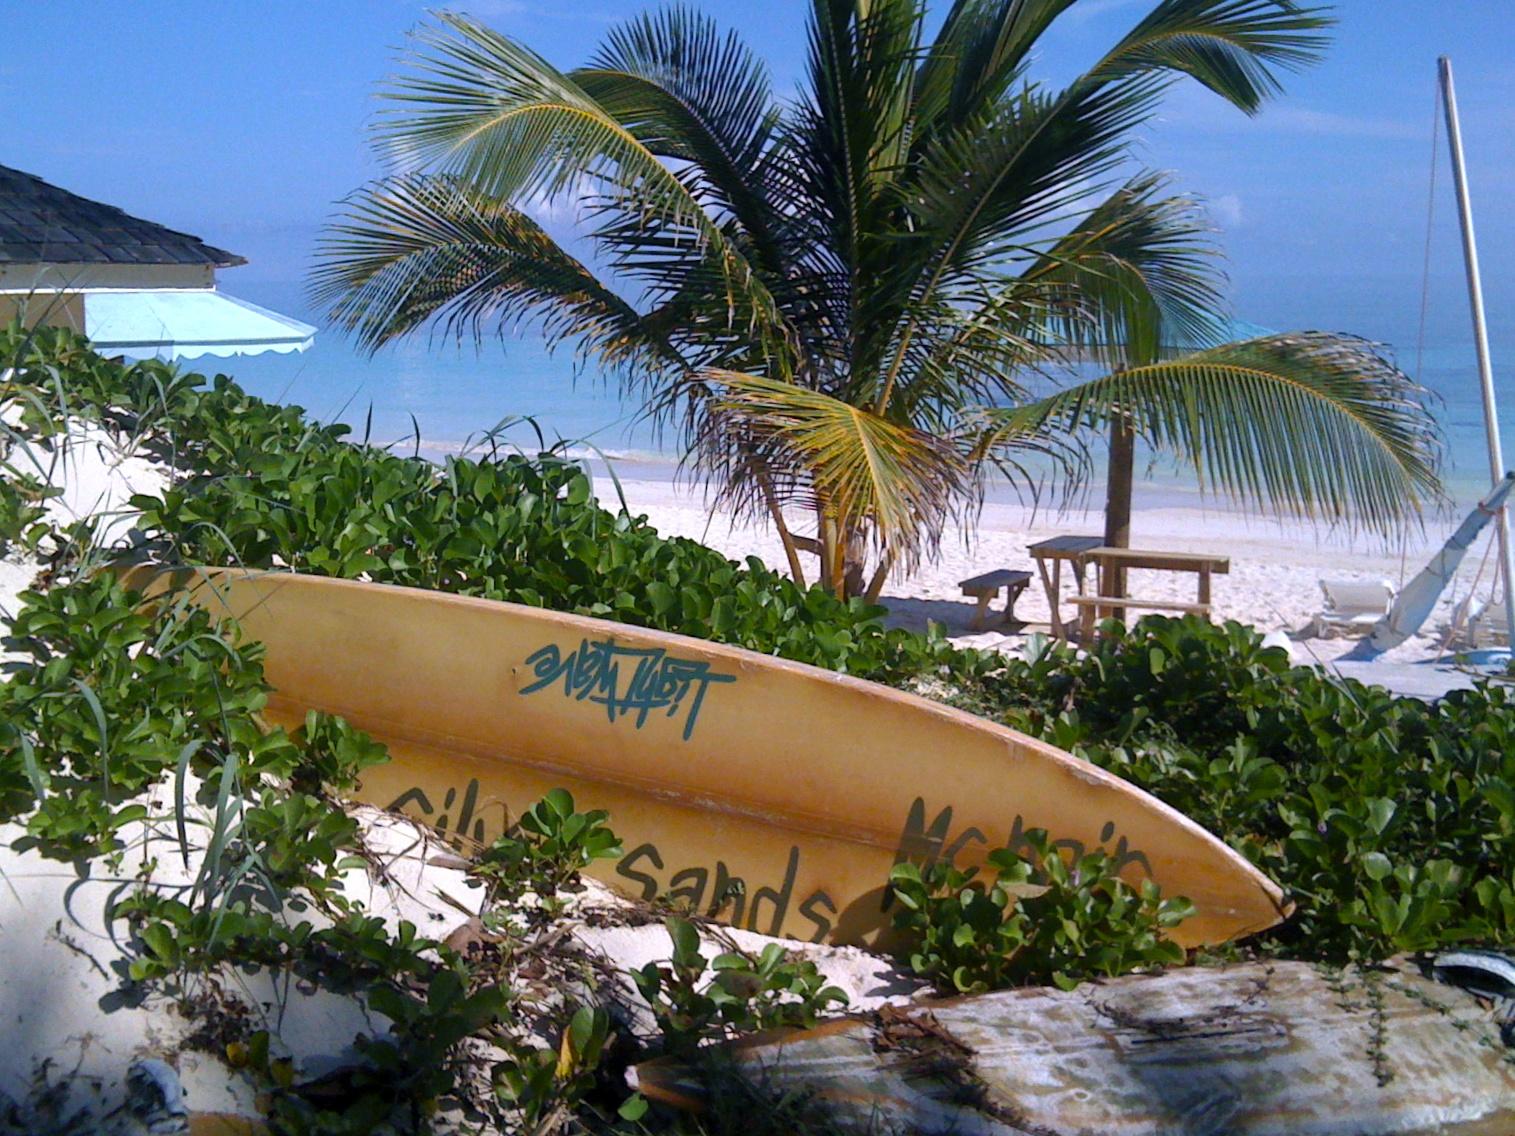 Surf Board @ Silver Sands.jpg